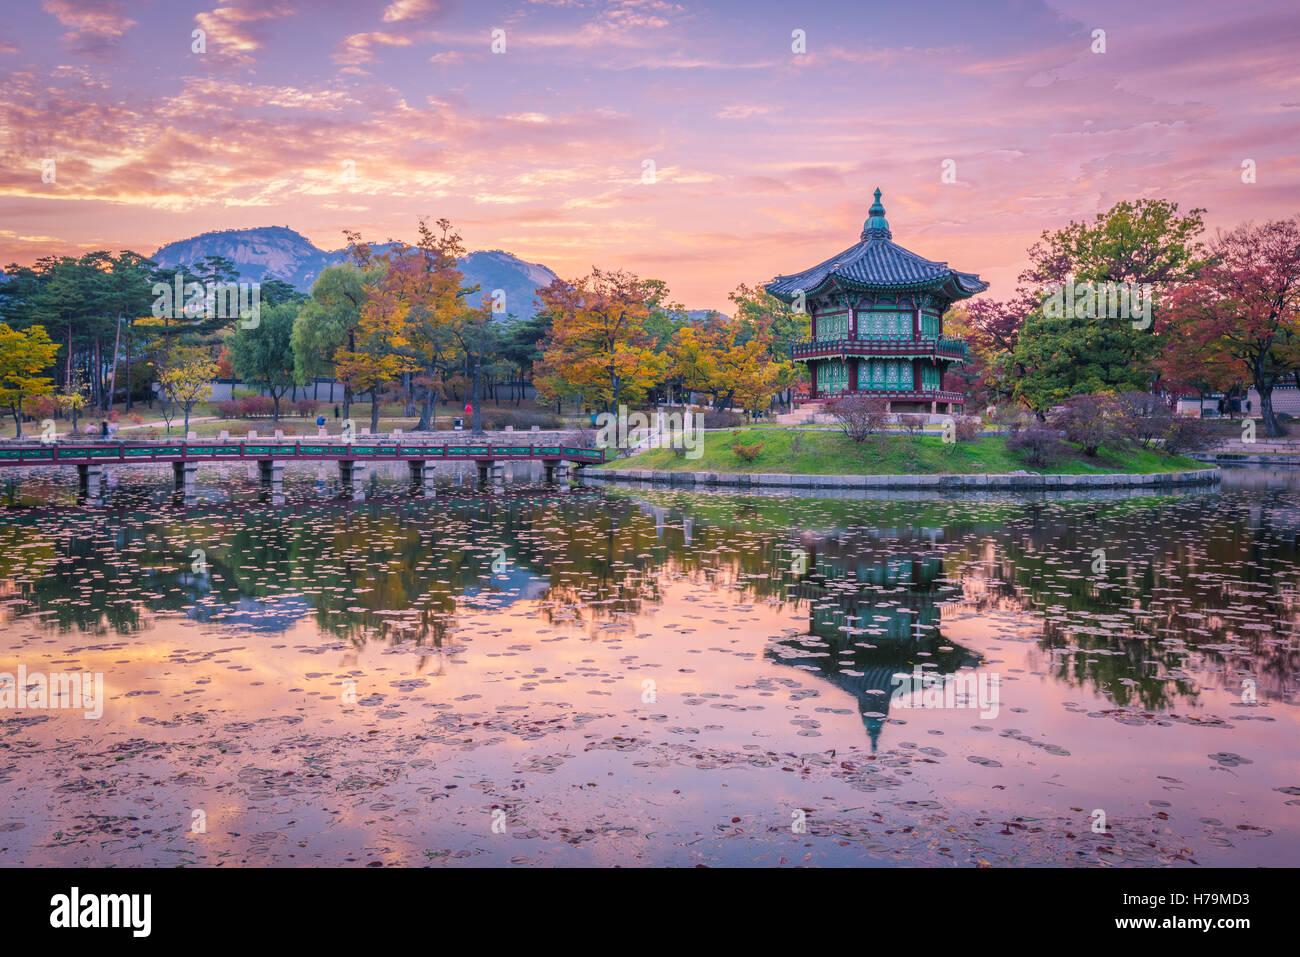 Sonnenuntergang Herbst Gyeongbokgung Palast in Seoul, Korea. Stockbild